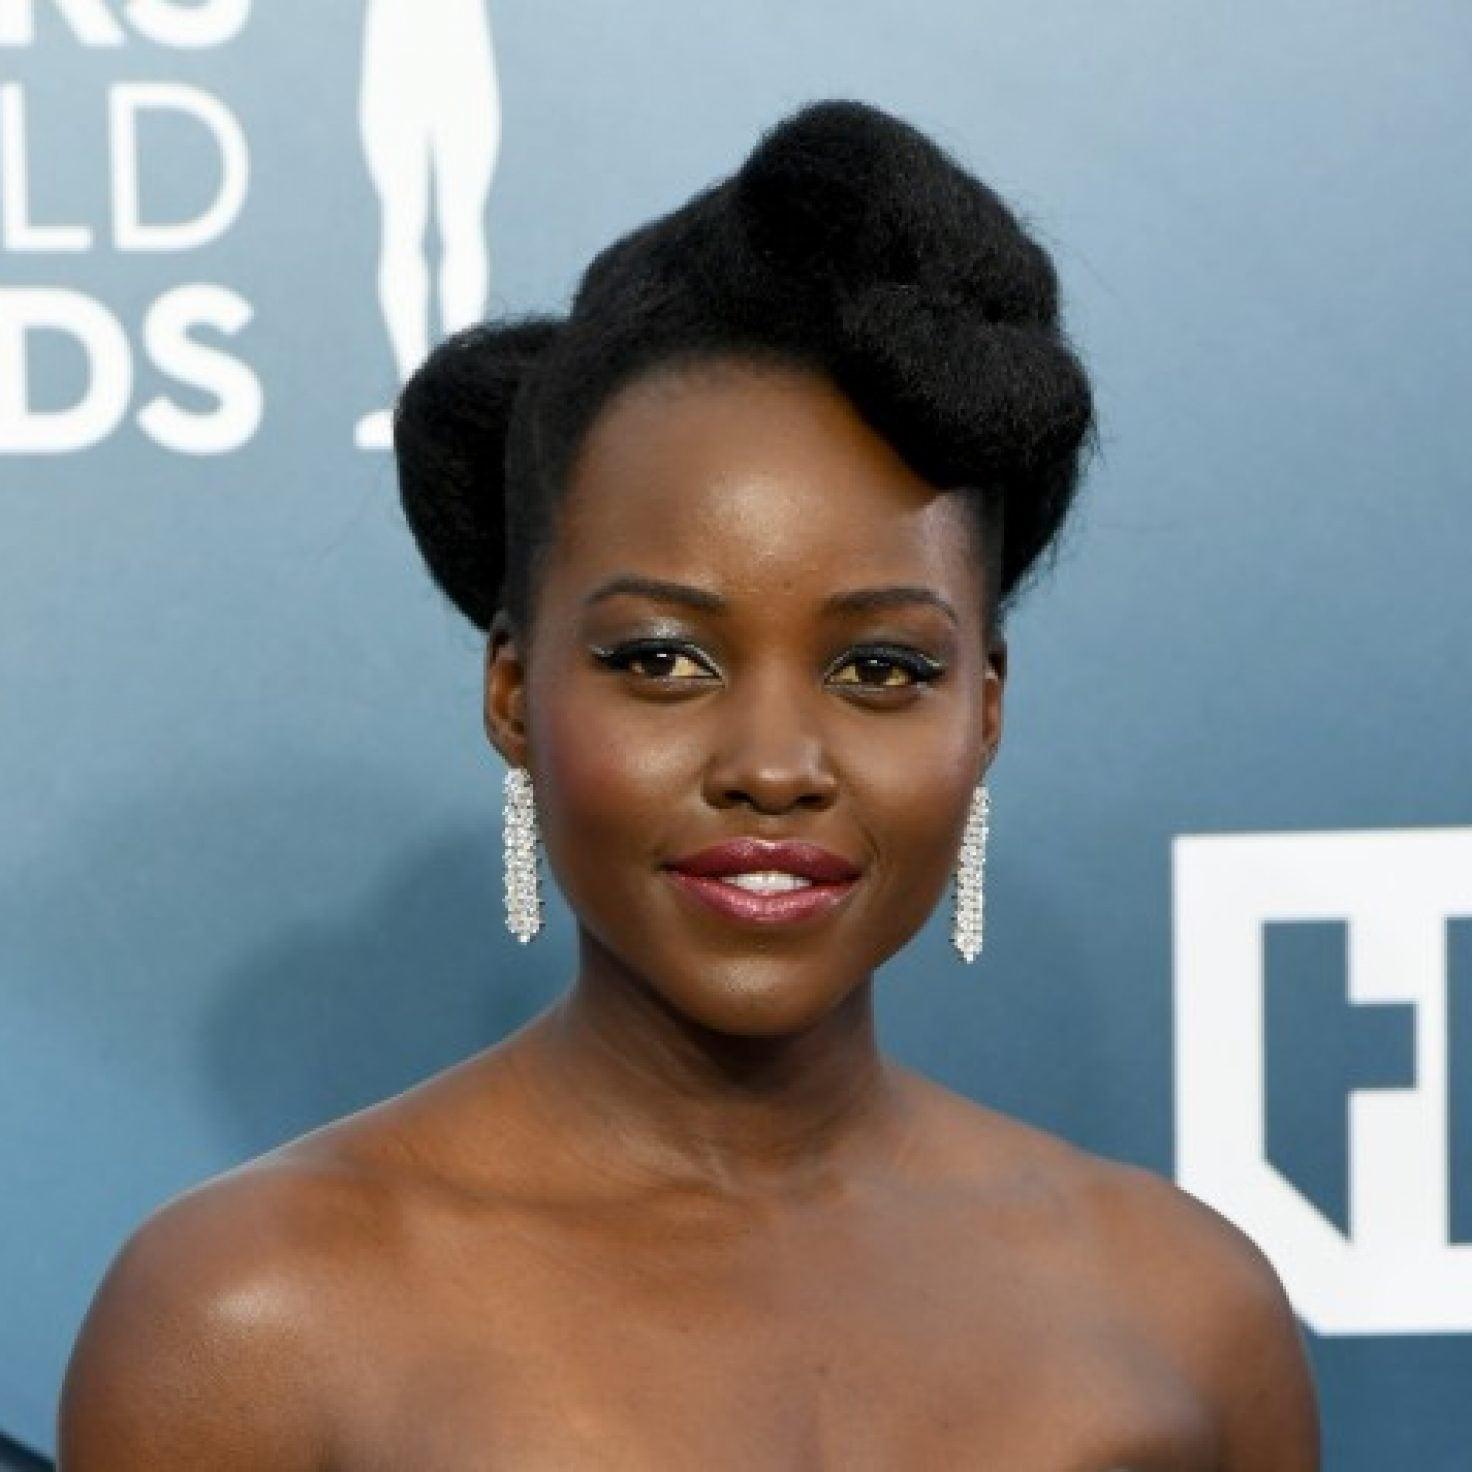 Lupita Nyong'o Stuns In Braided Bangs